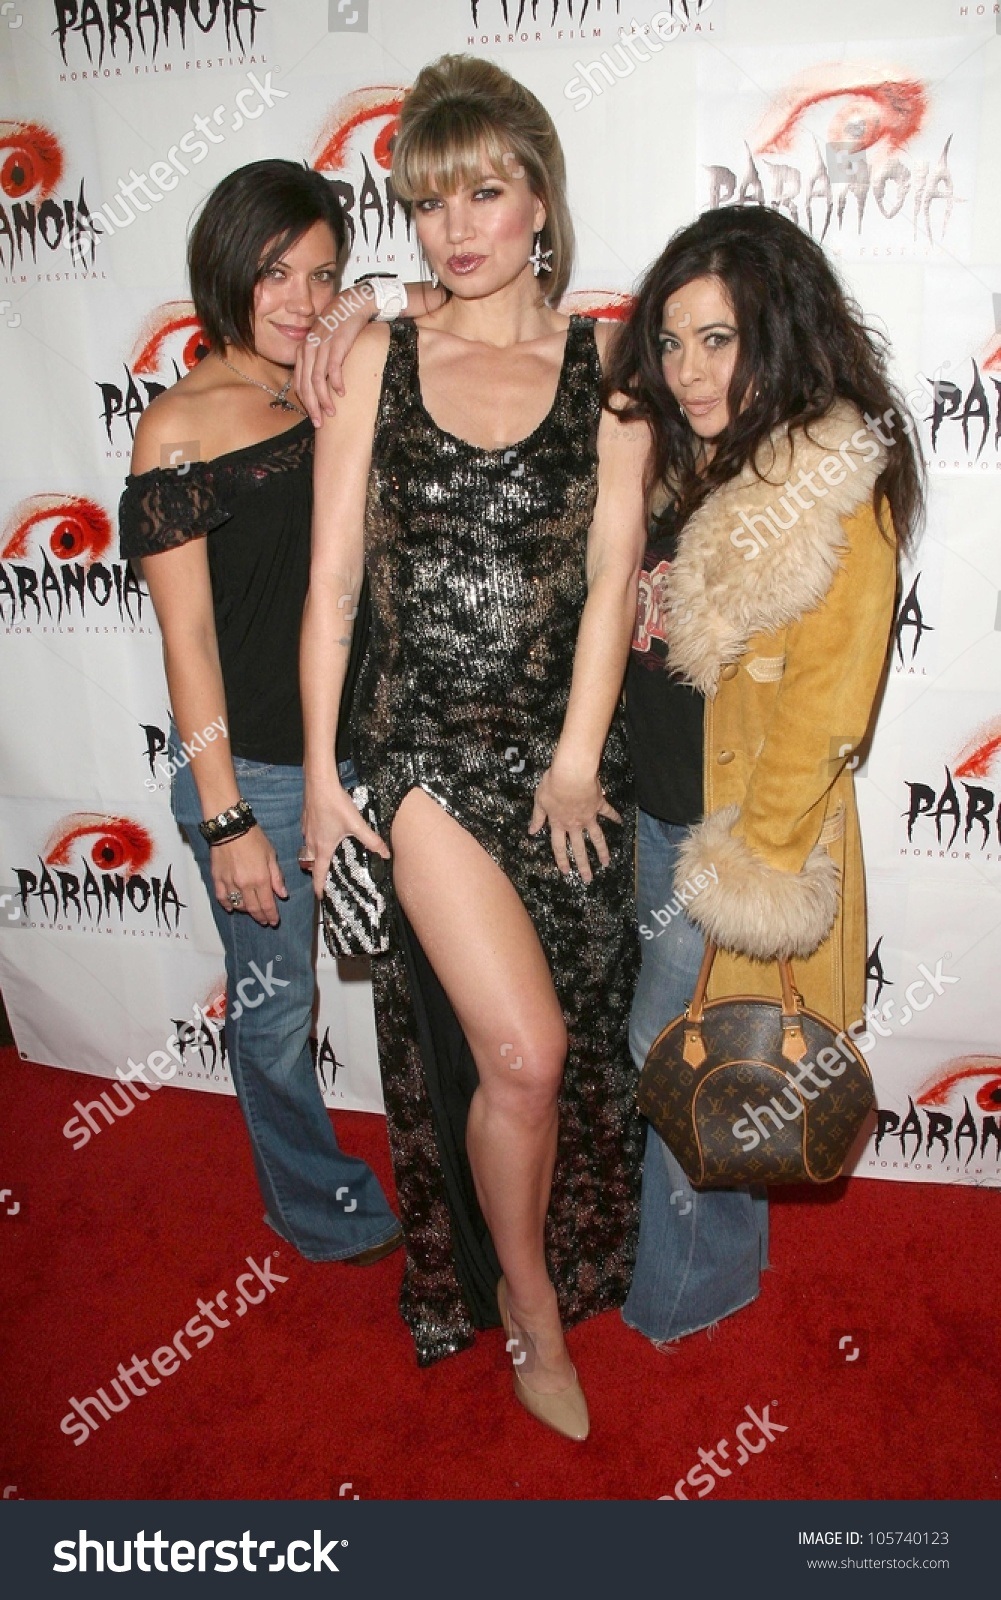 Terence Stamp (born 1938),Joan Crawford Erotic nude Ajita Wilson,Tatiana Kovylina RUS 2 2005, 2009